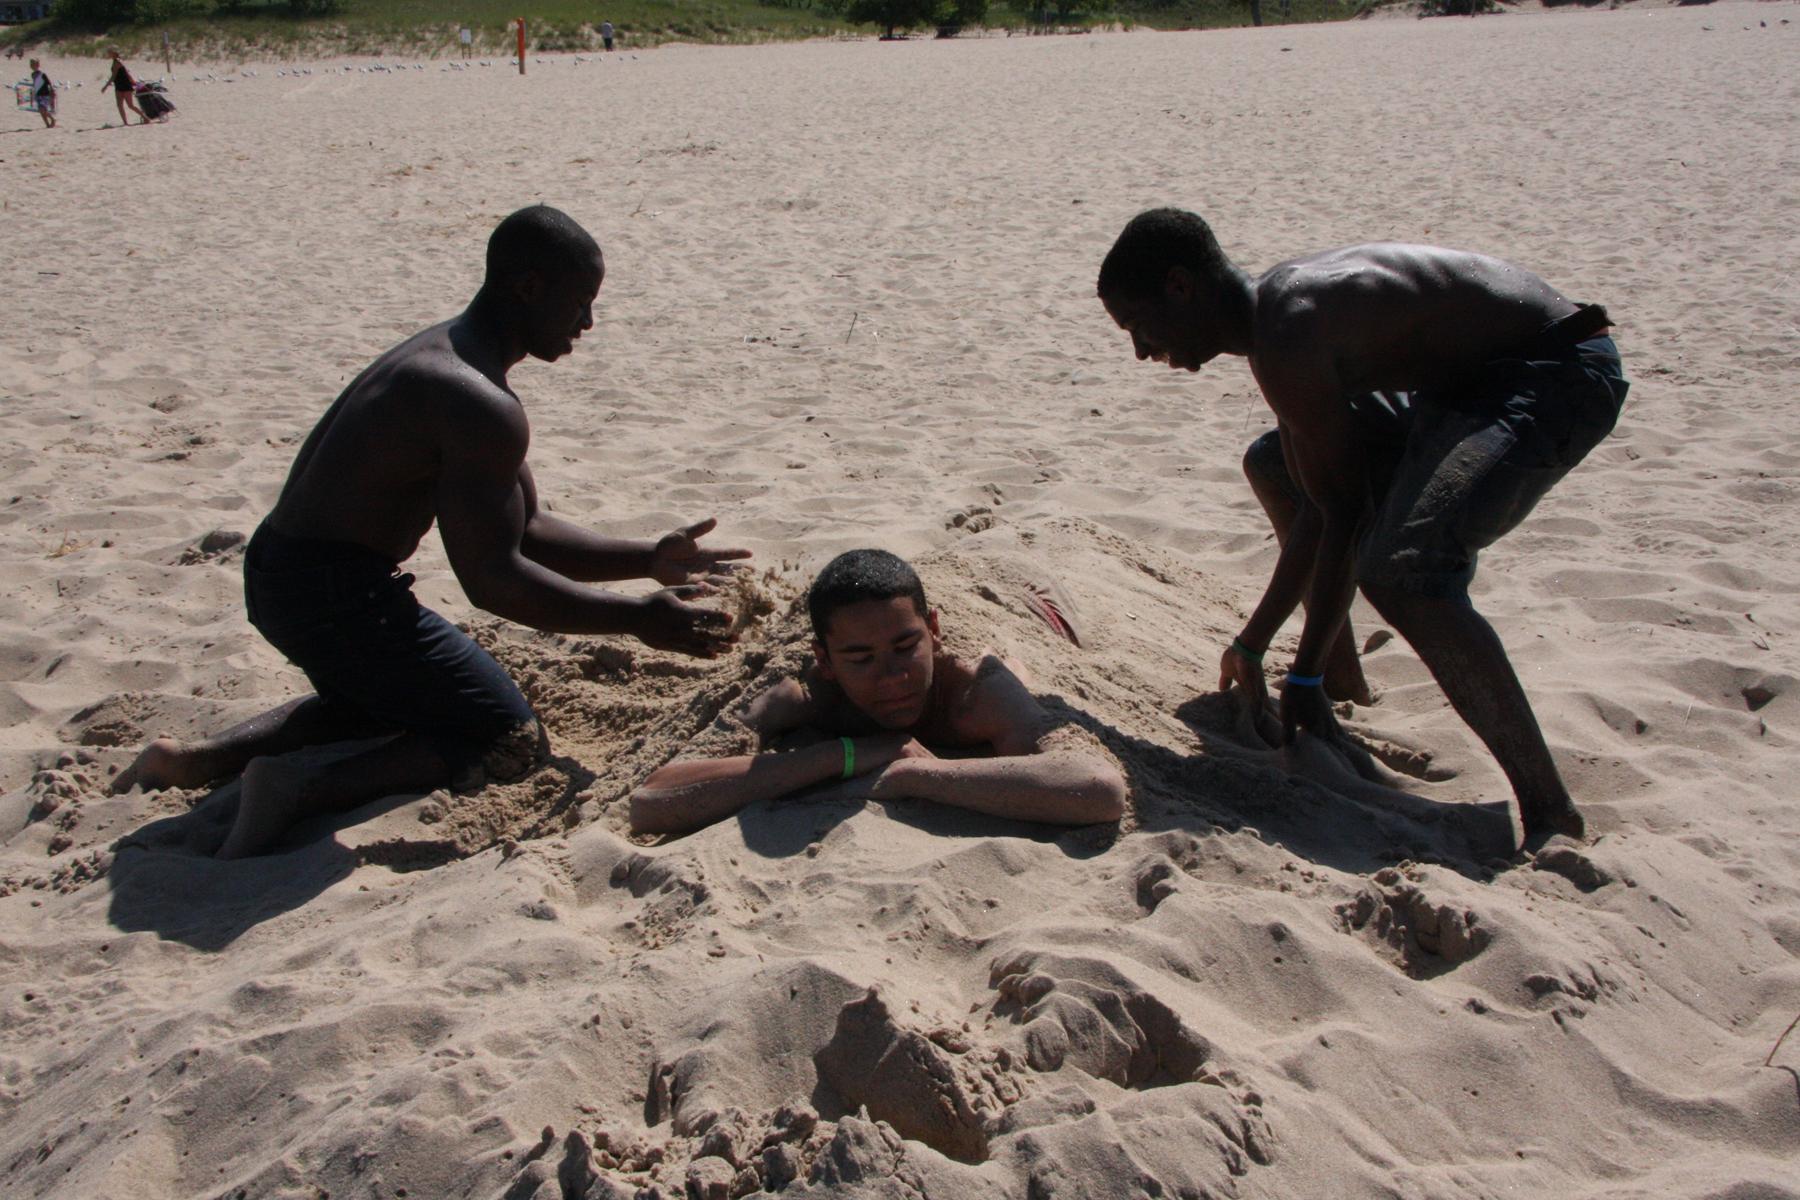 Jon buried